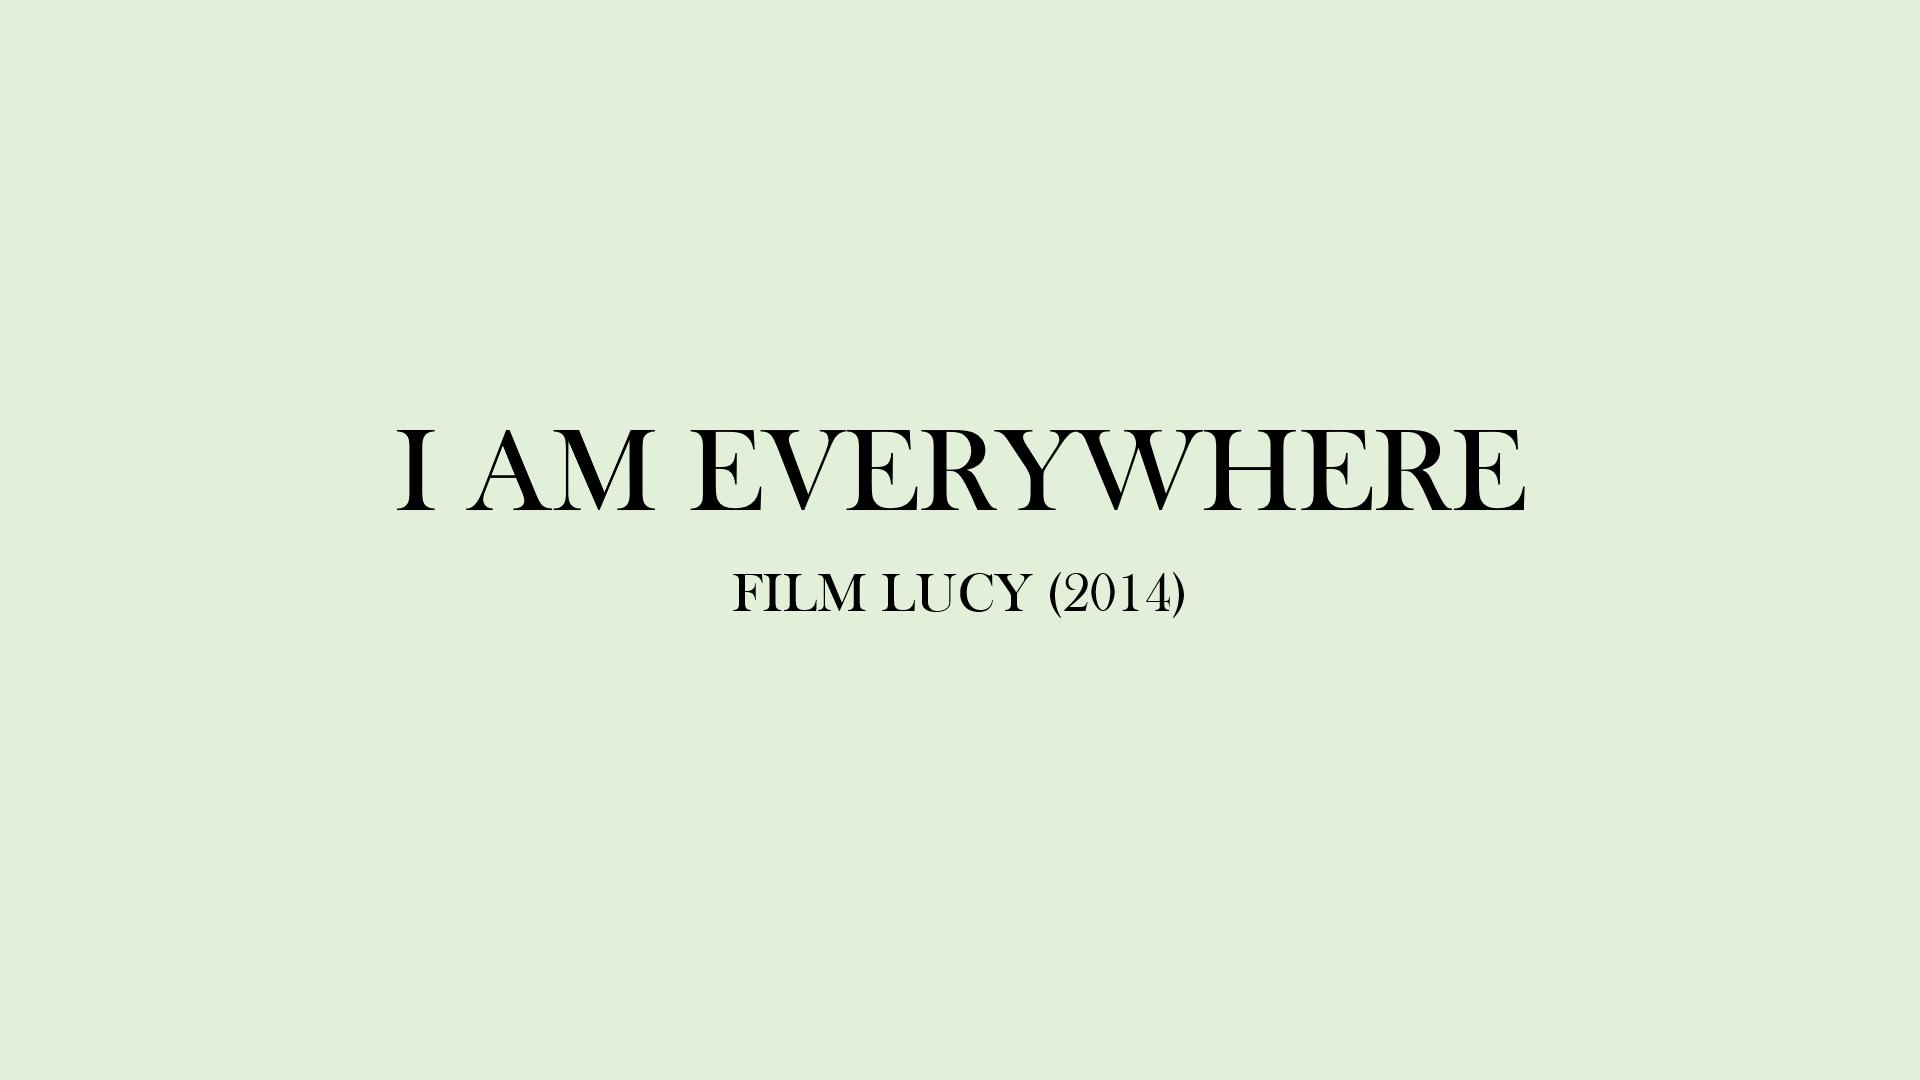 penjelasan Film Lucy : I AM EVERYWHERE